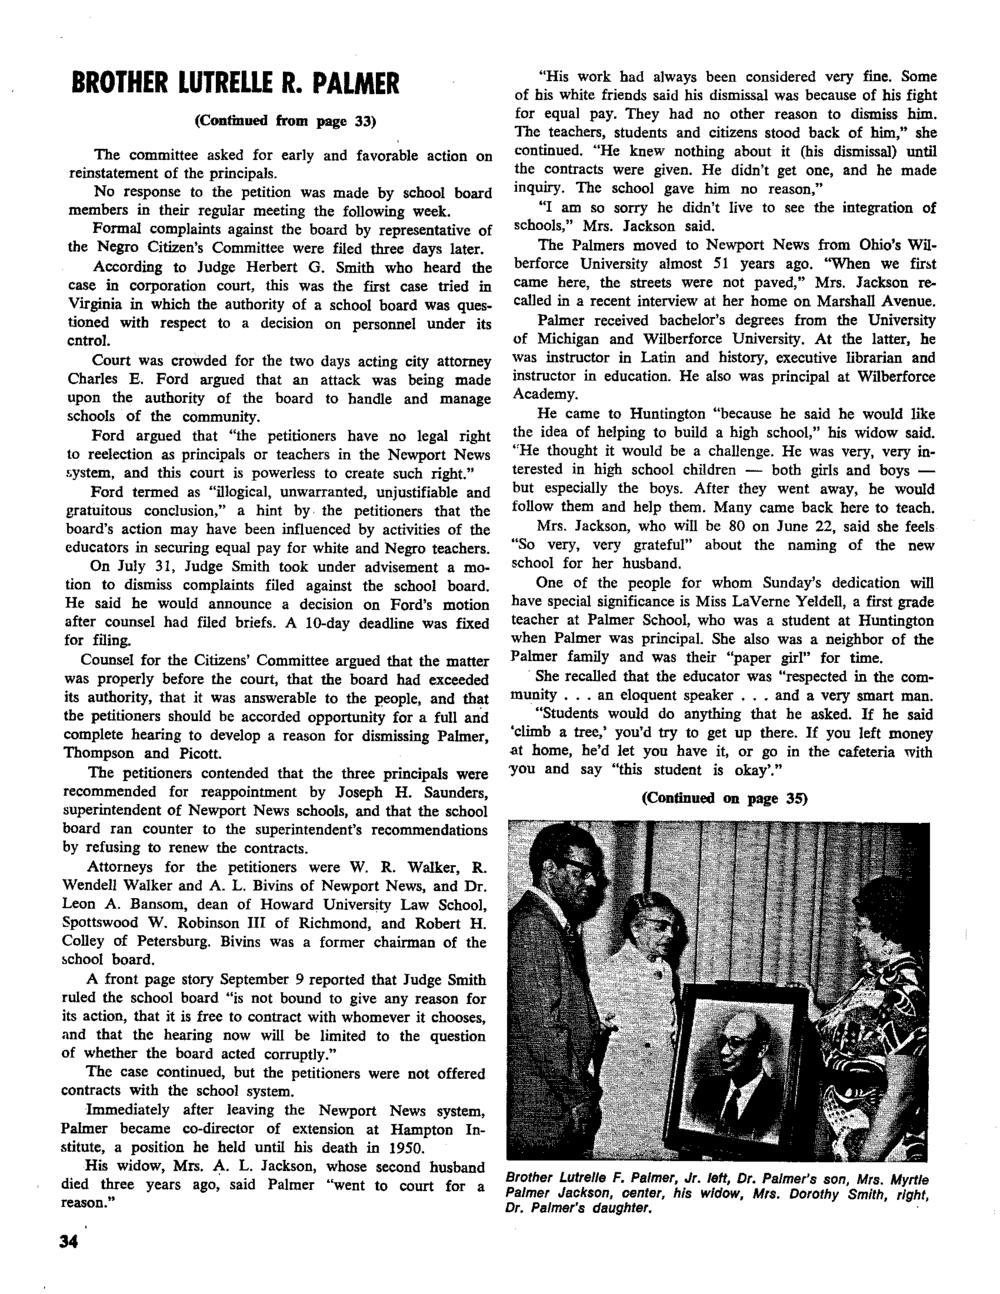 Zeta Lambda 1972 - Palmer Elementary School Dedication 2.png